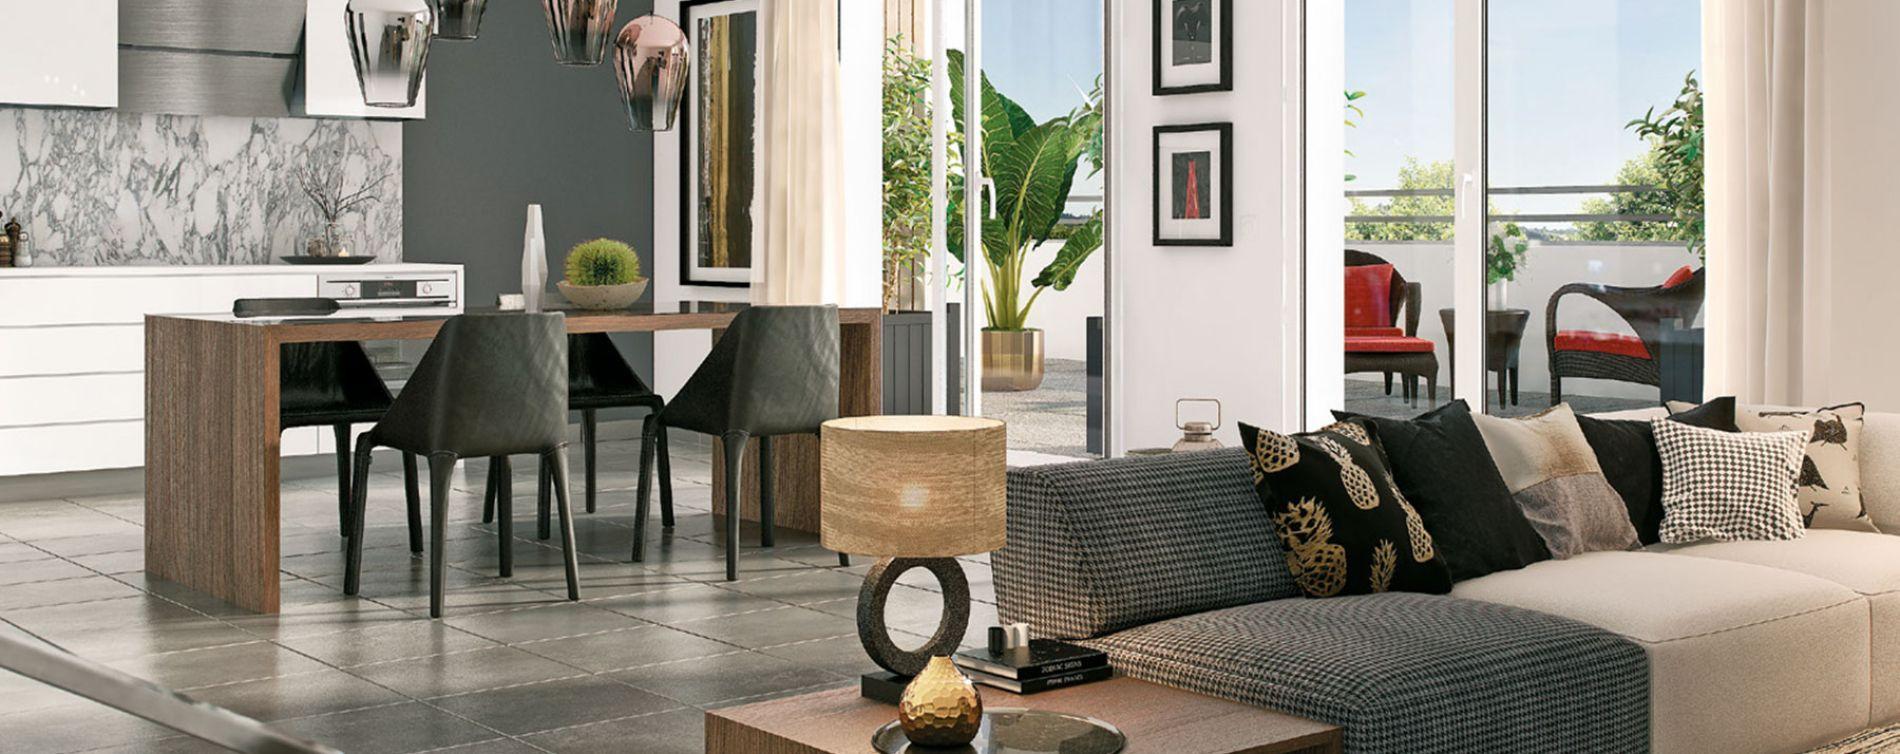 Nort-sur-Erdre : programme immobilier neuve « Coeur Bocage » (3)